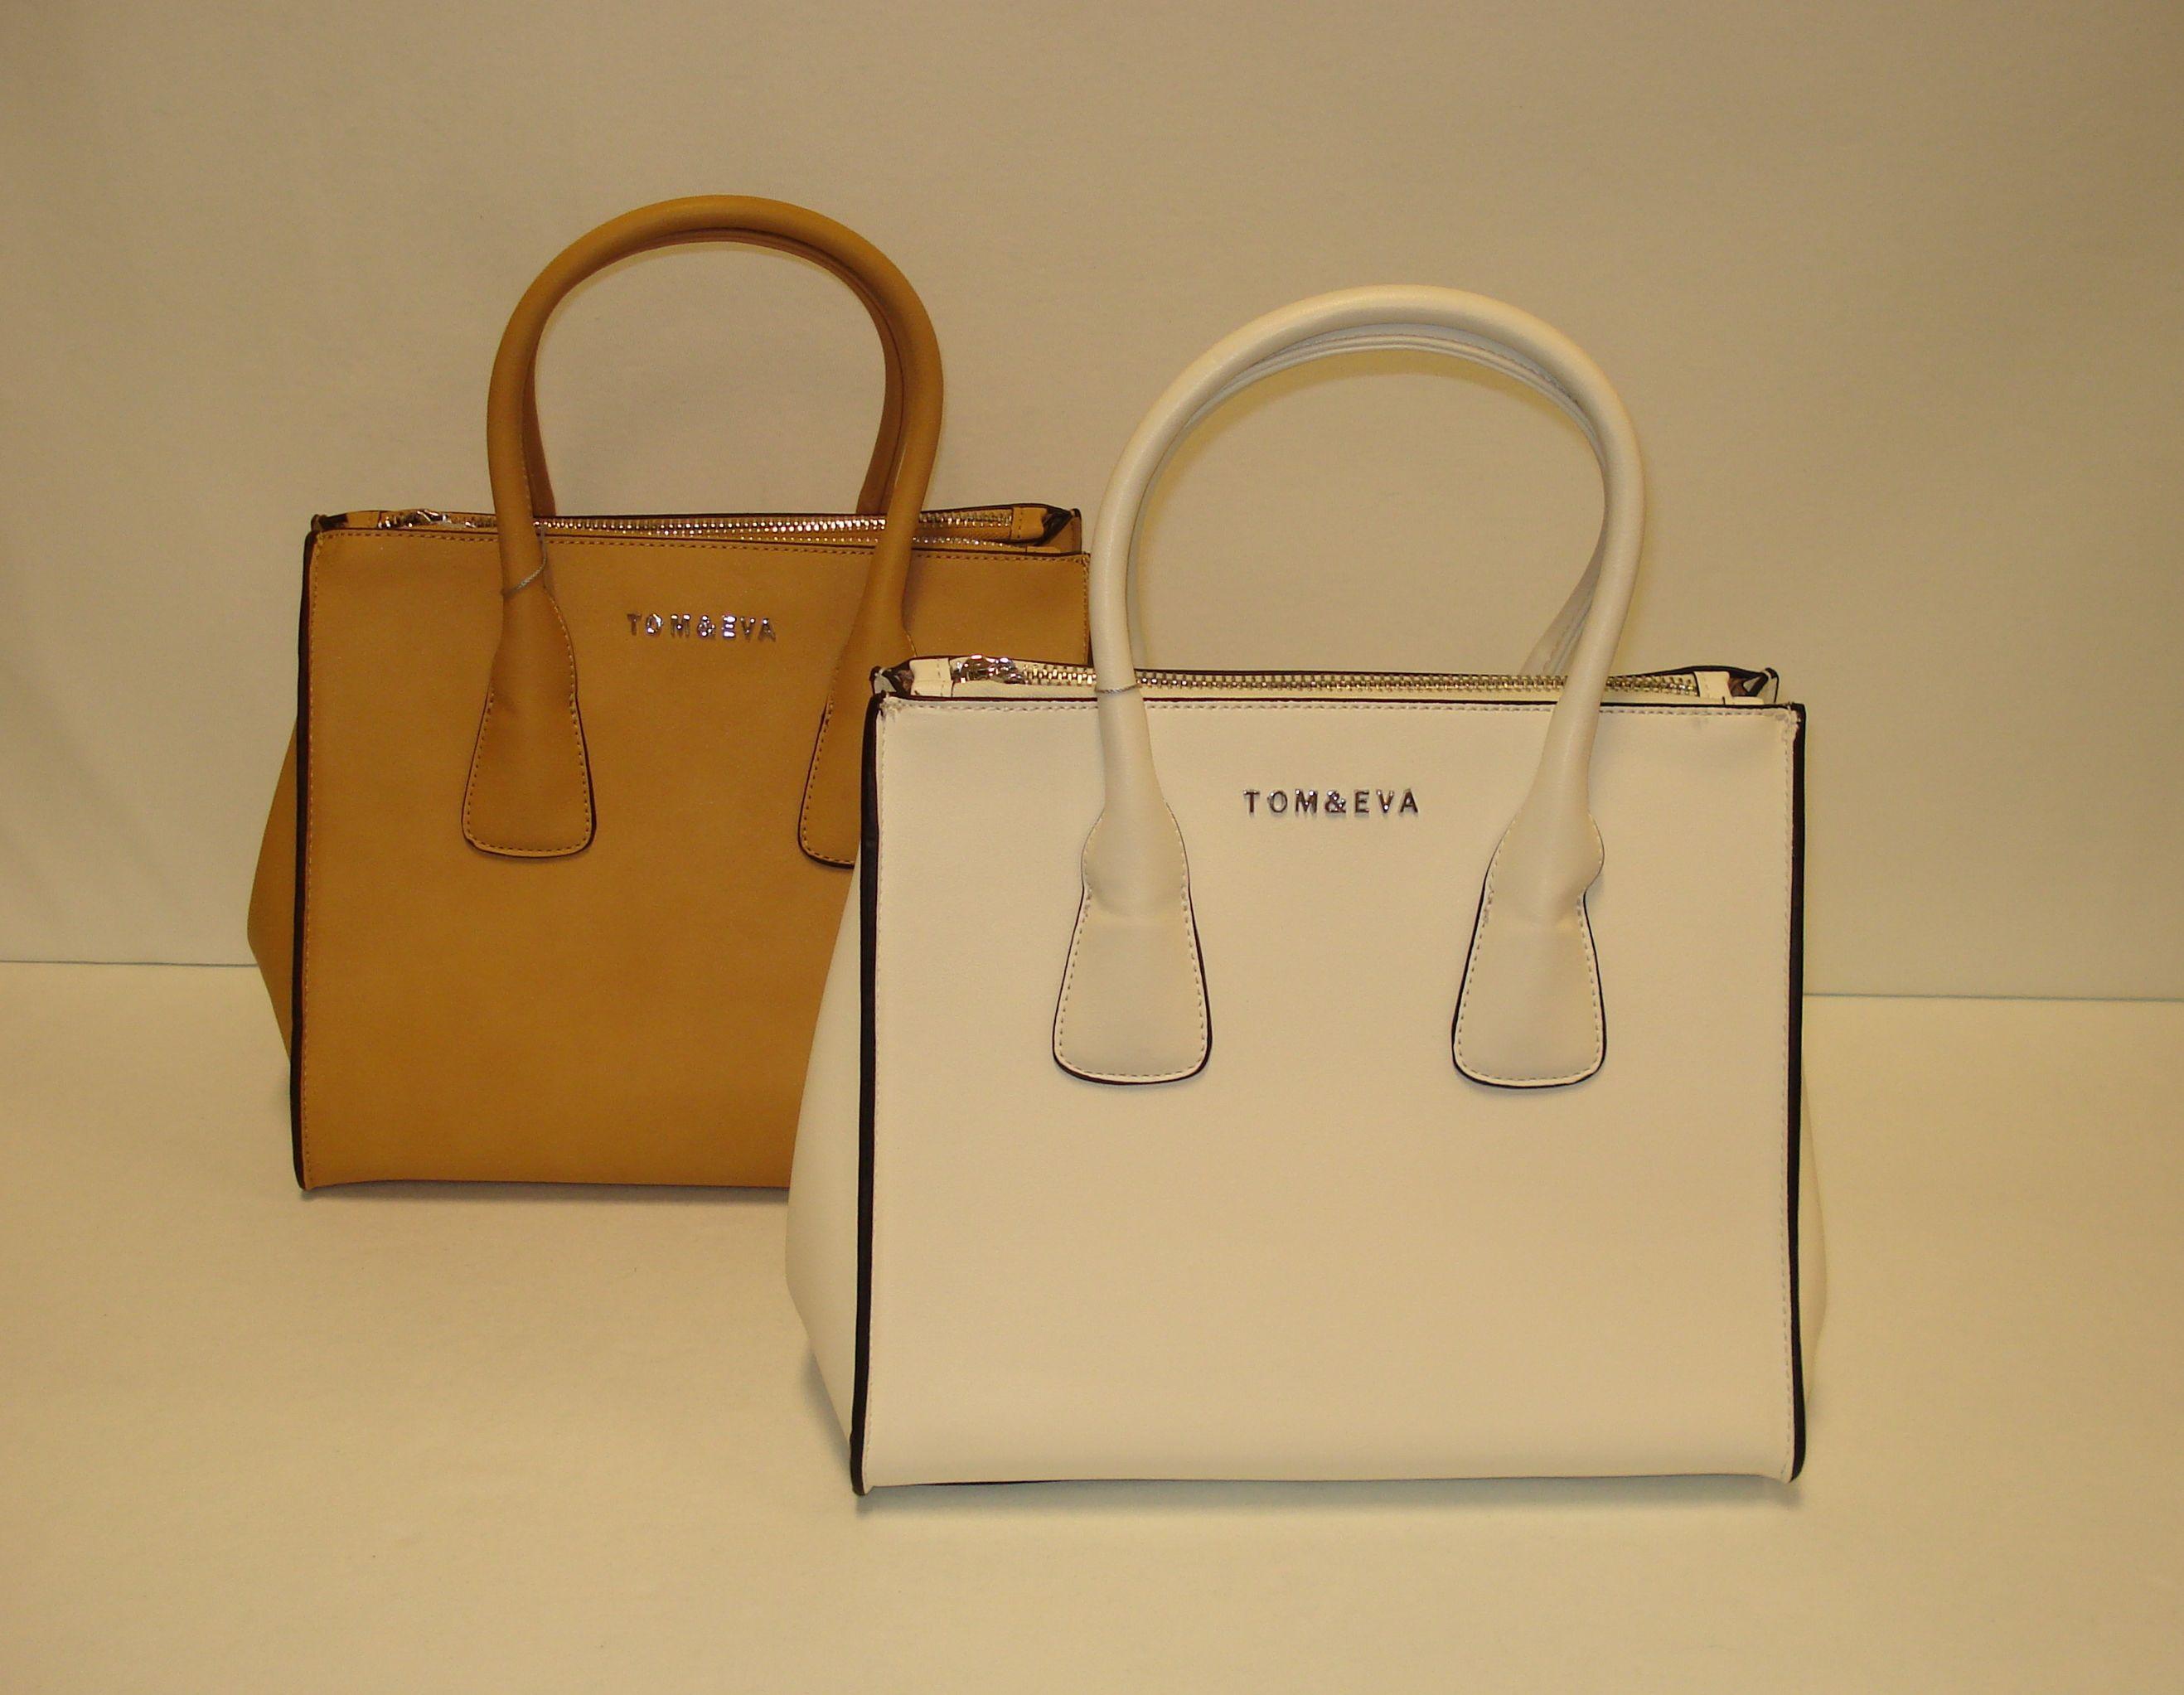 Tom Eva Tomandeva Handbags Fashion Purses Accessories Boes Winnipeg